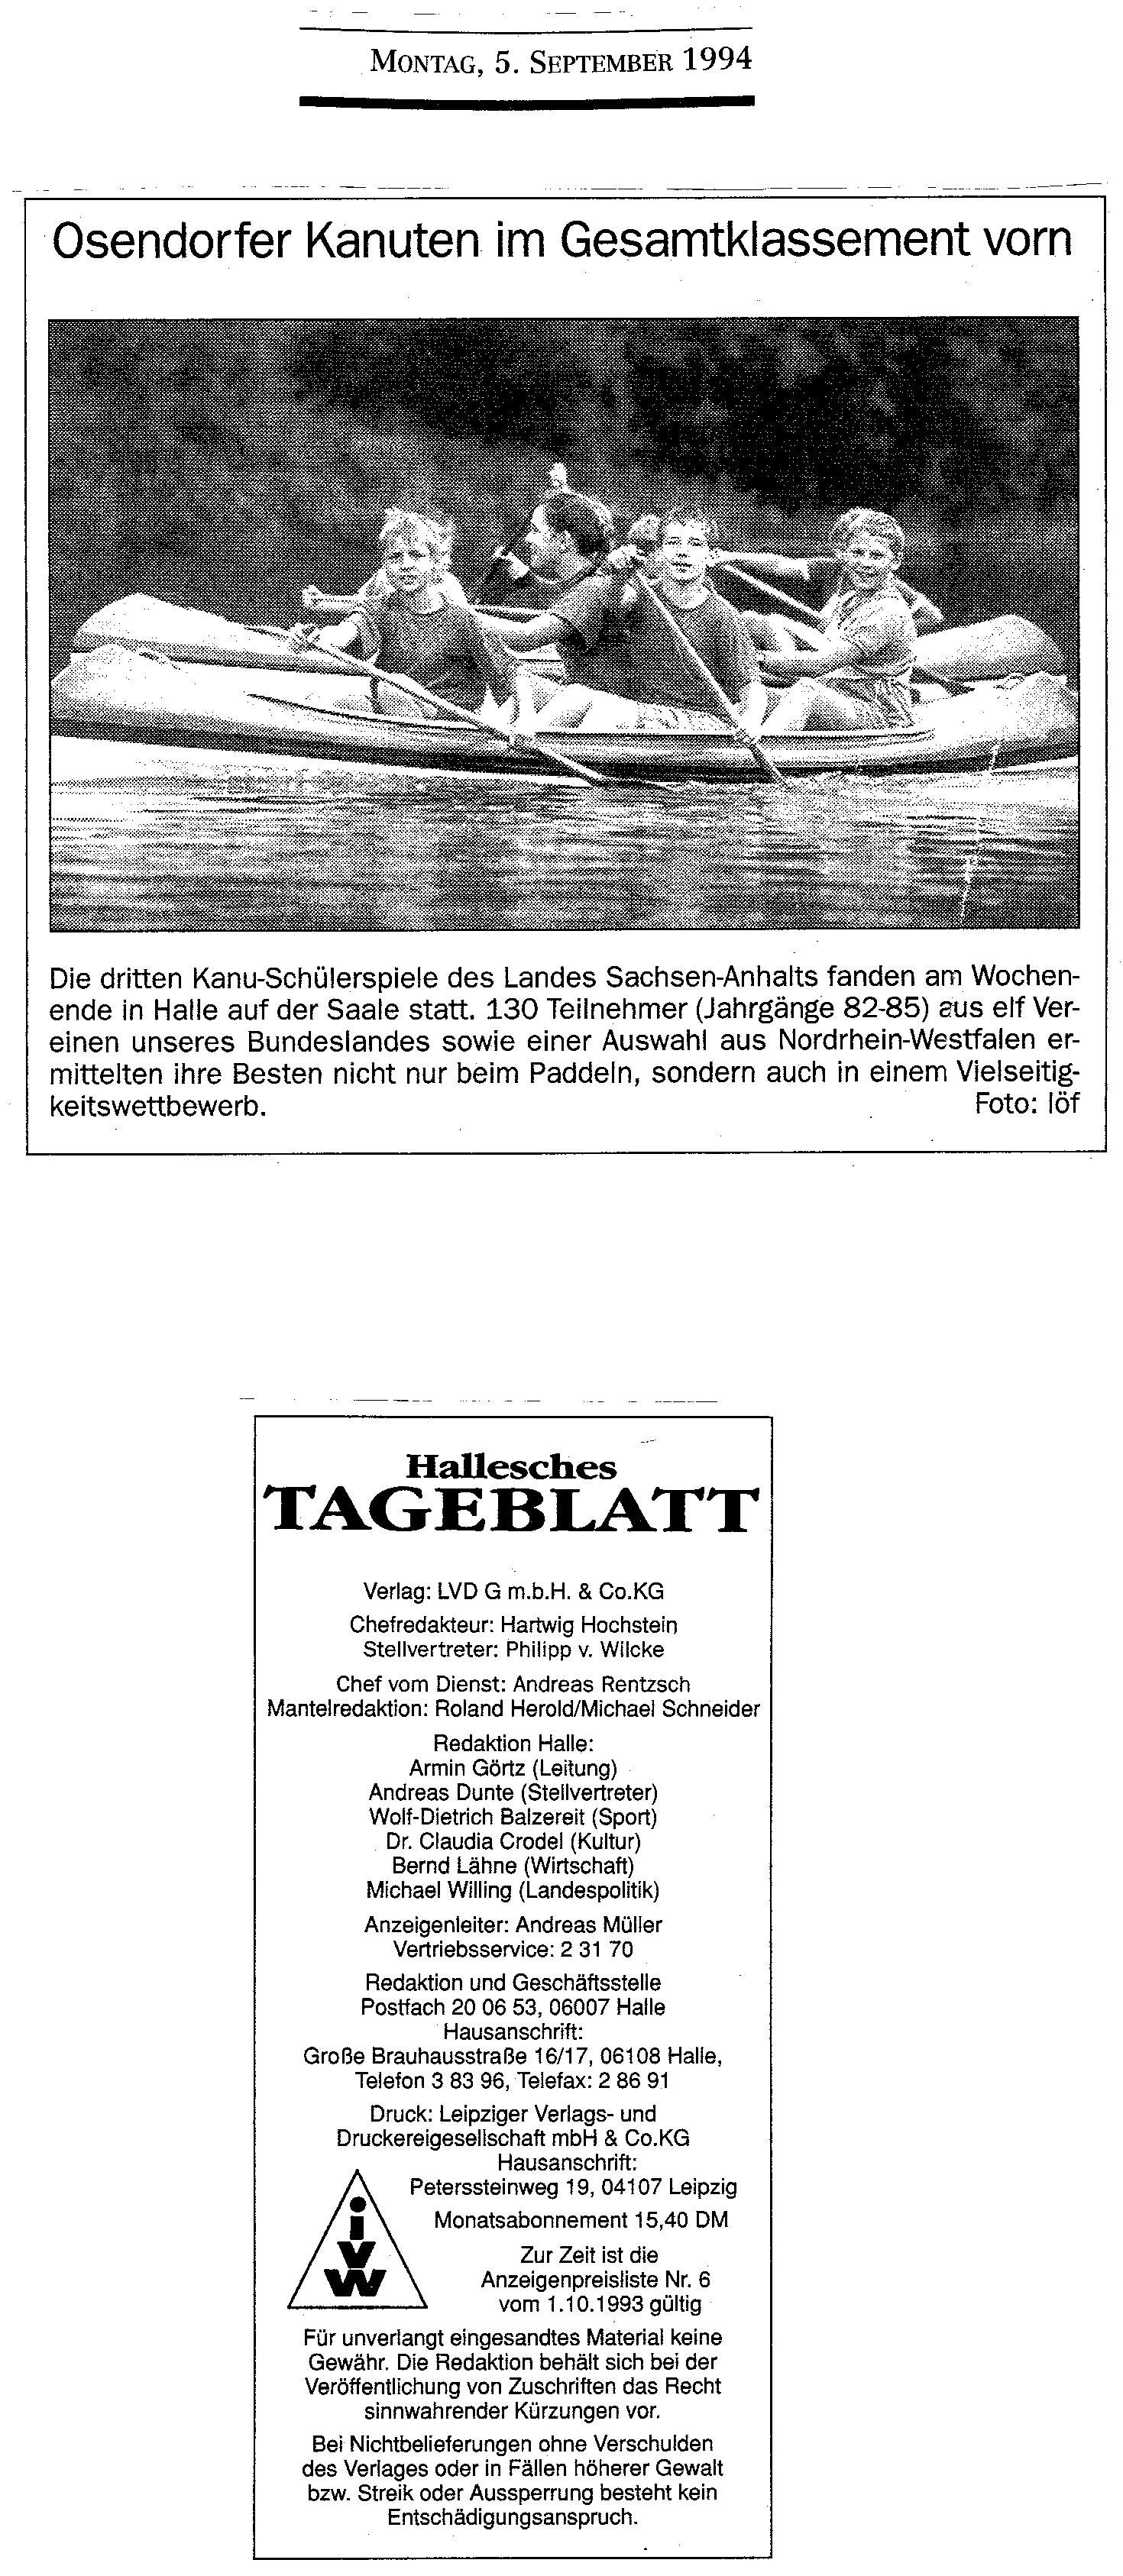 1994-09-05 Osendorfer Kanuten im Gesamtklassement vorn